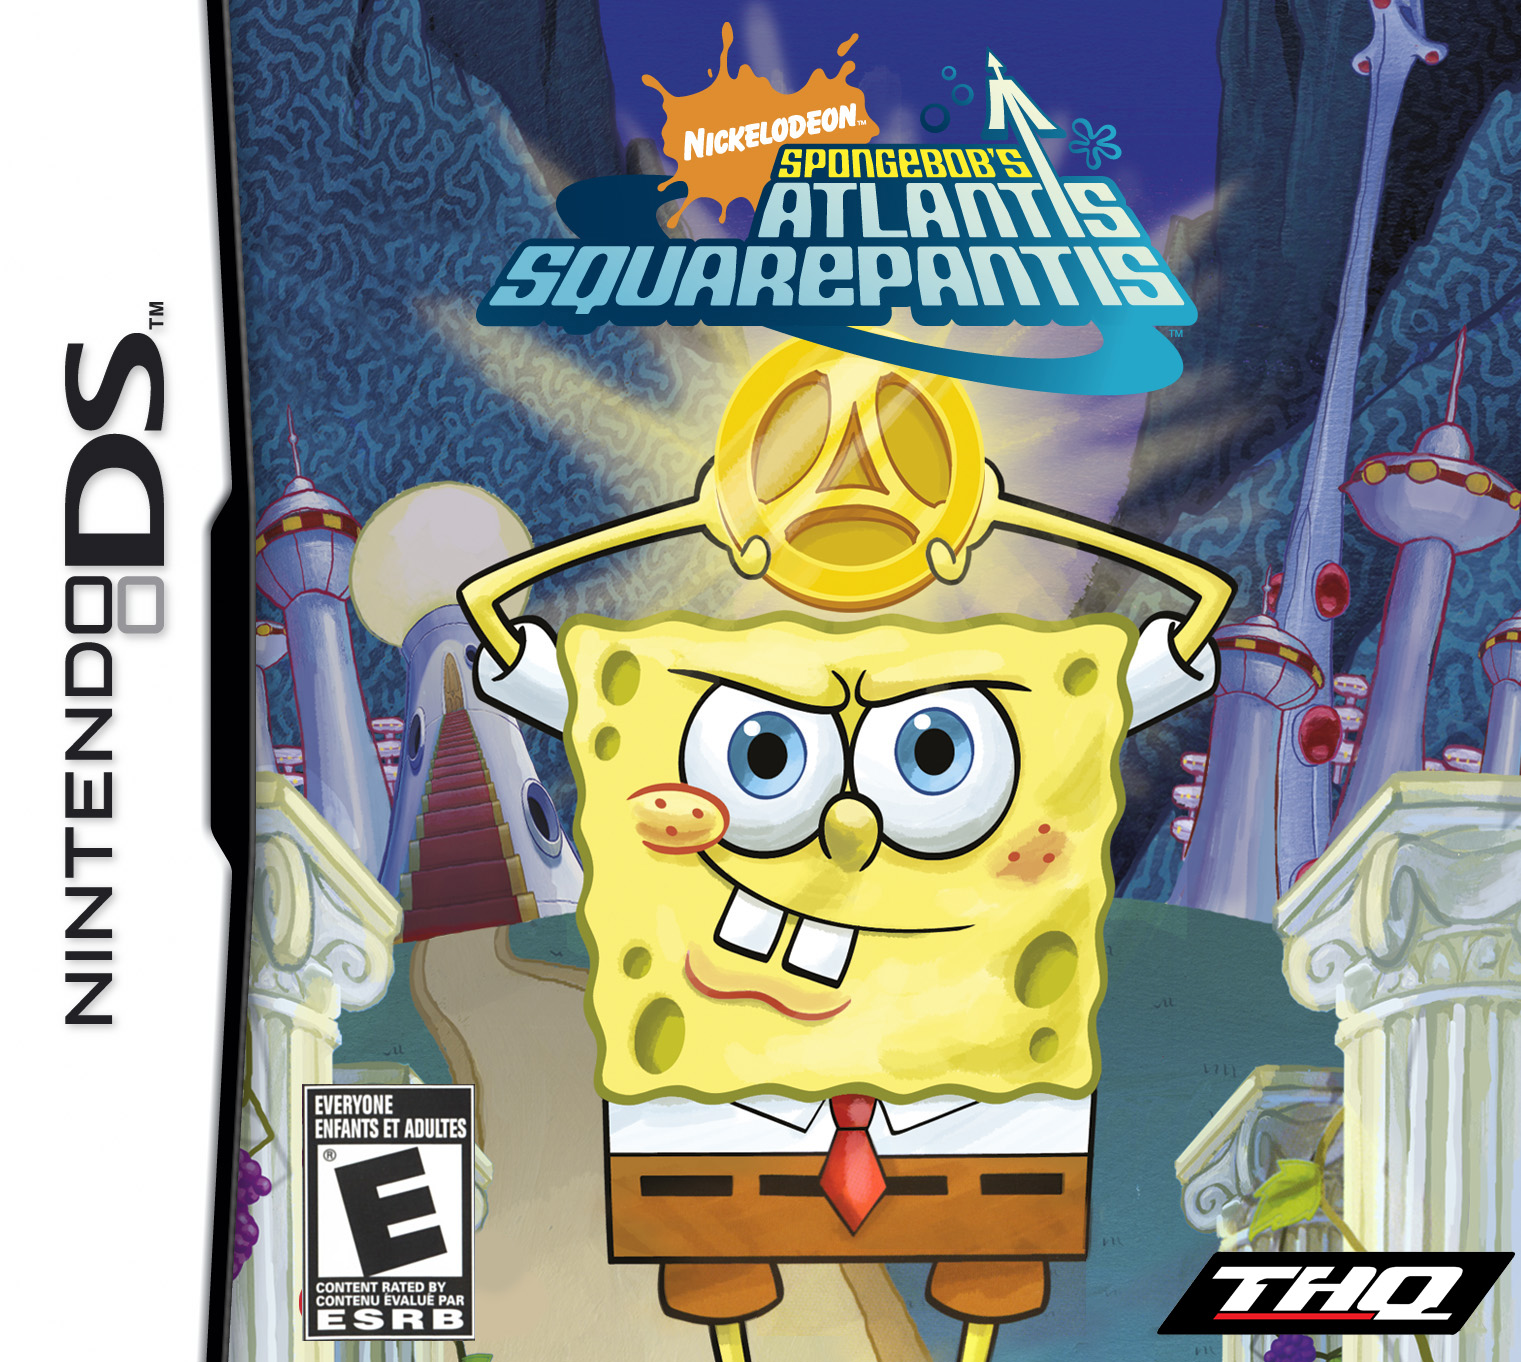 File:SpongeBob's Atlantis SquarePantis.jpg